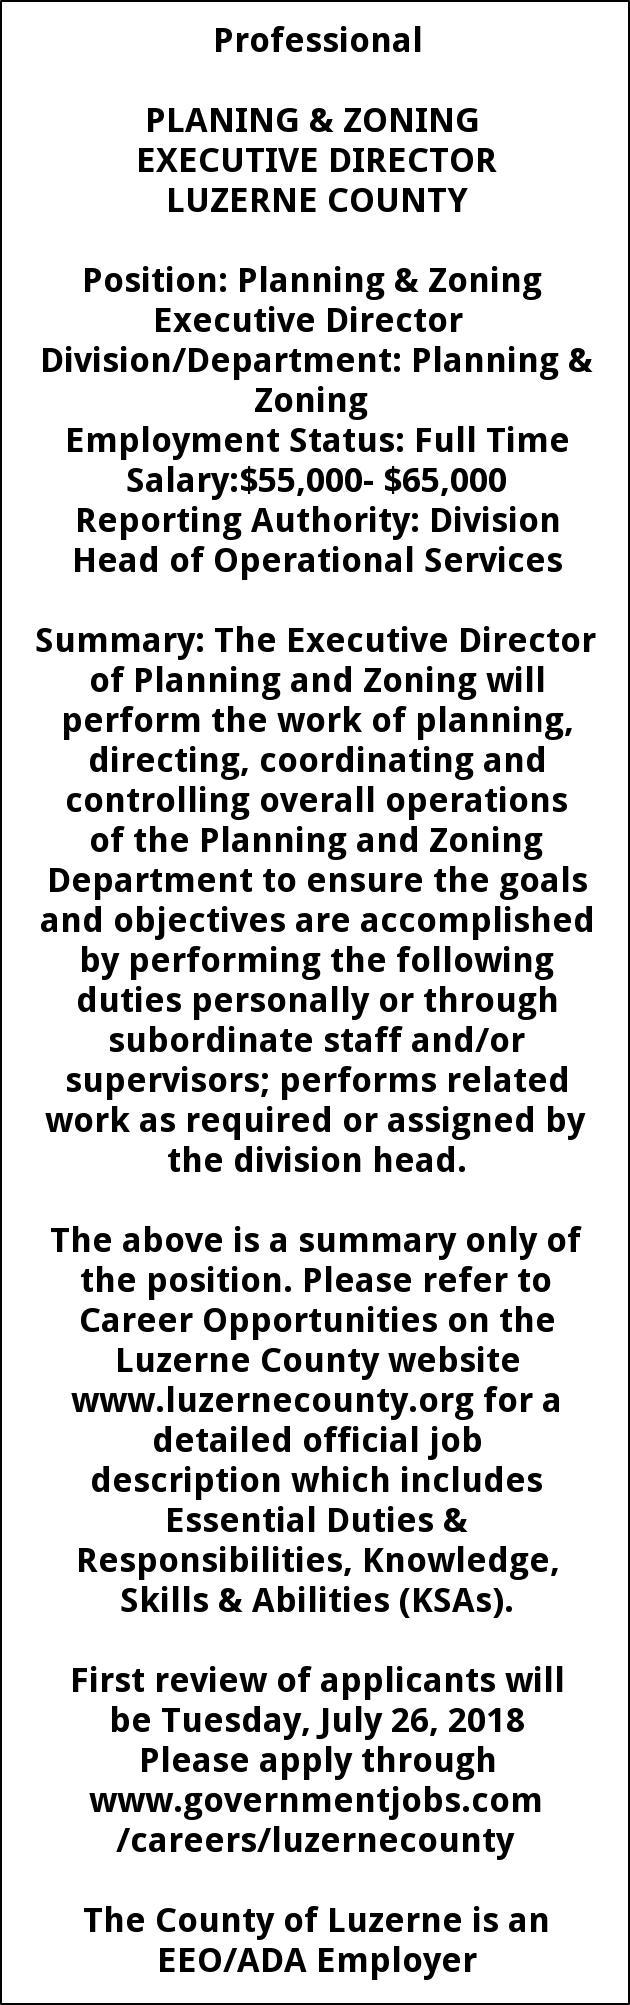 Planning & Zoning Exec Director